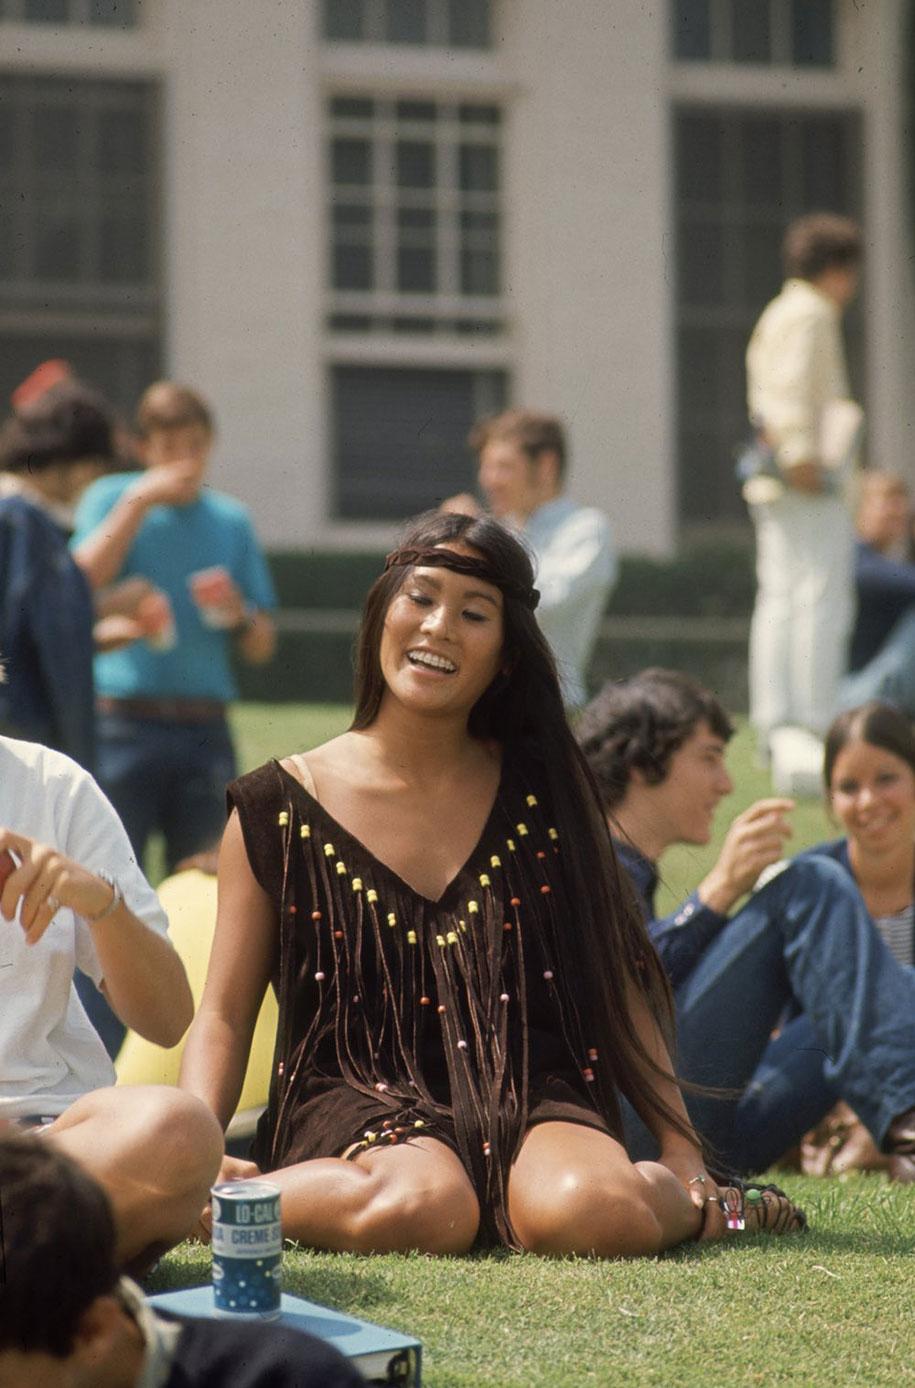 1969-hippie-high-school-counterculture-photography-4